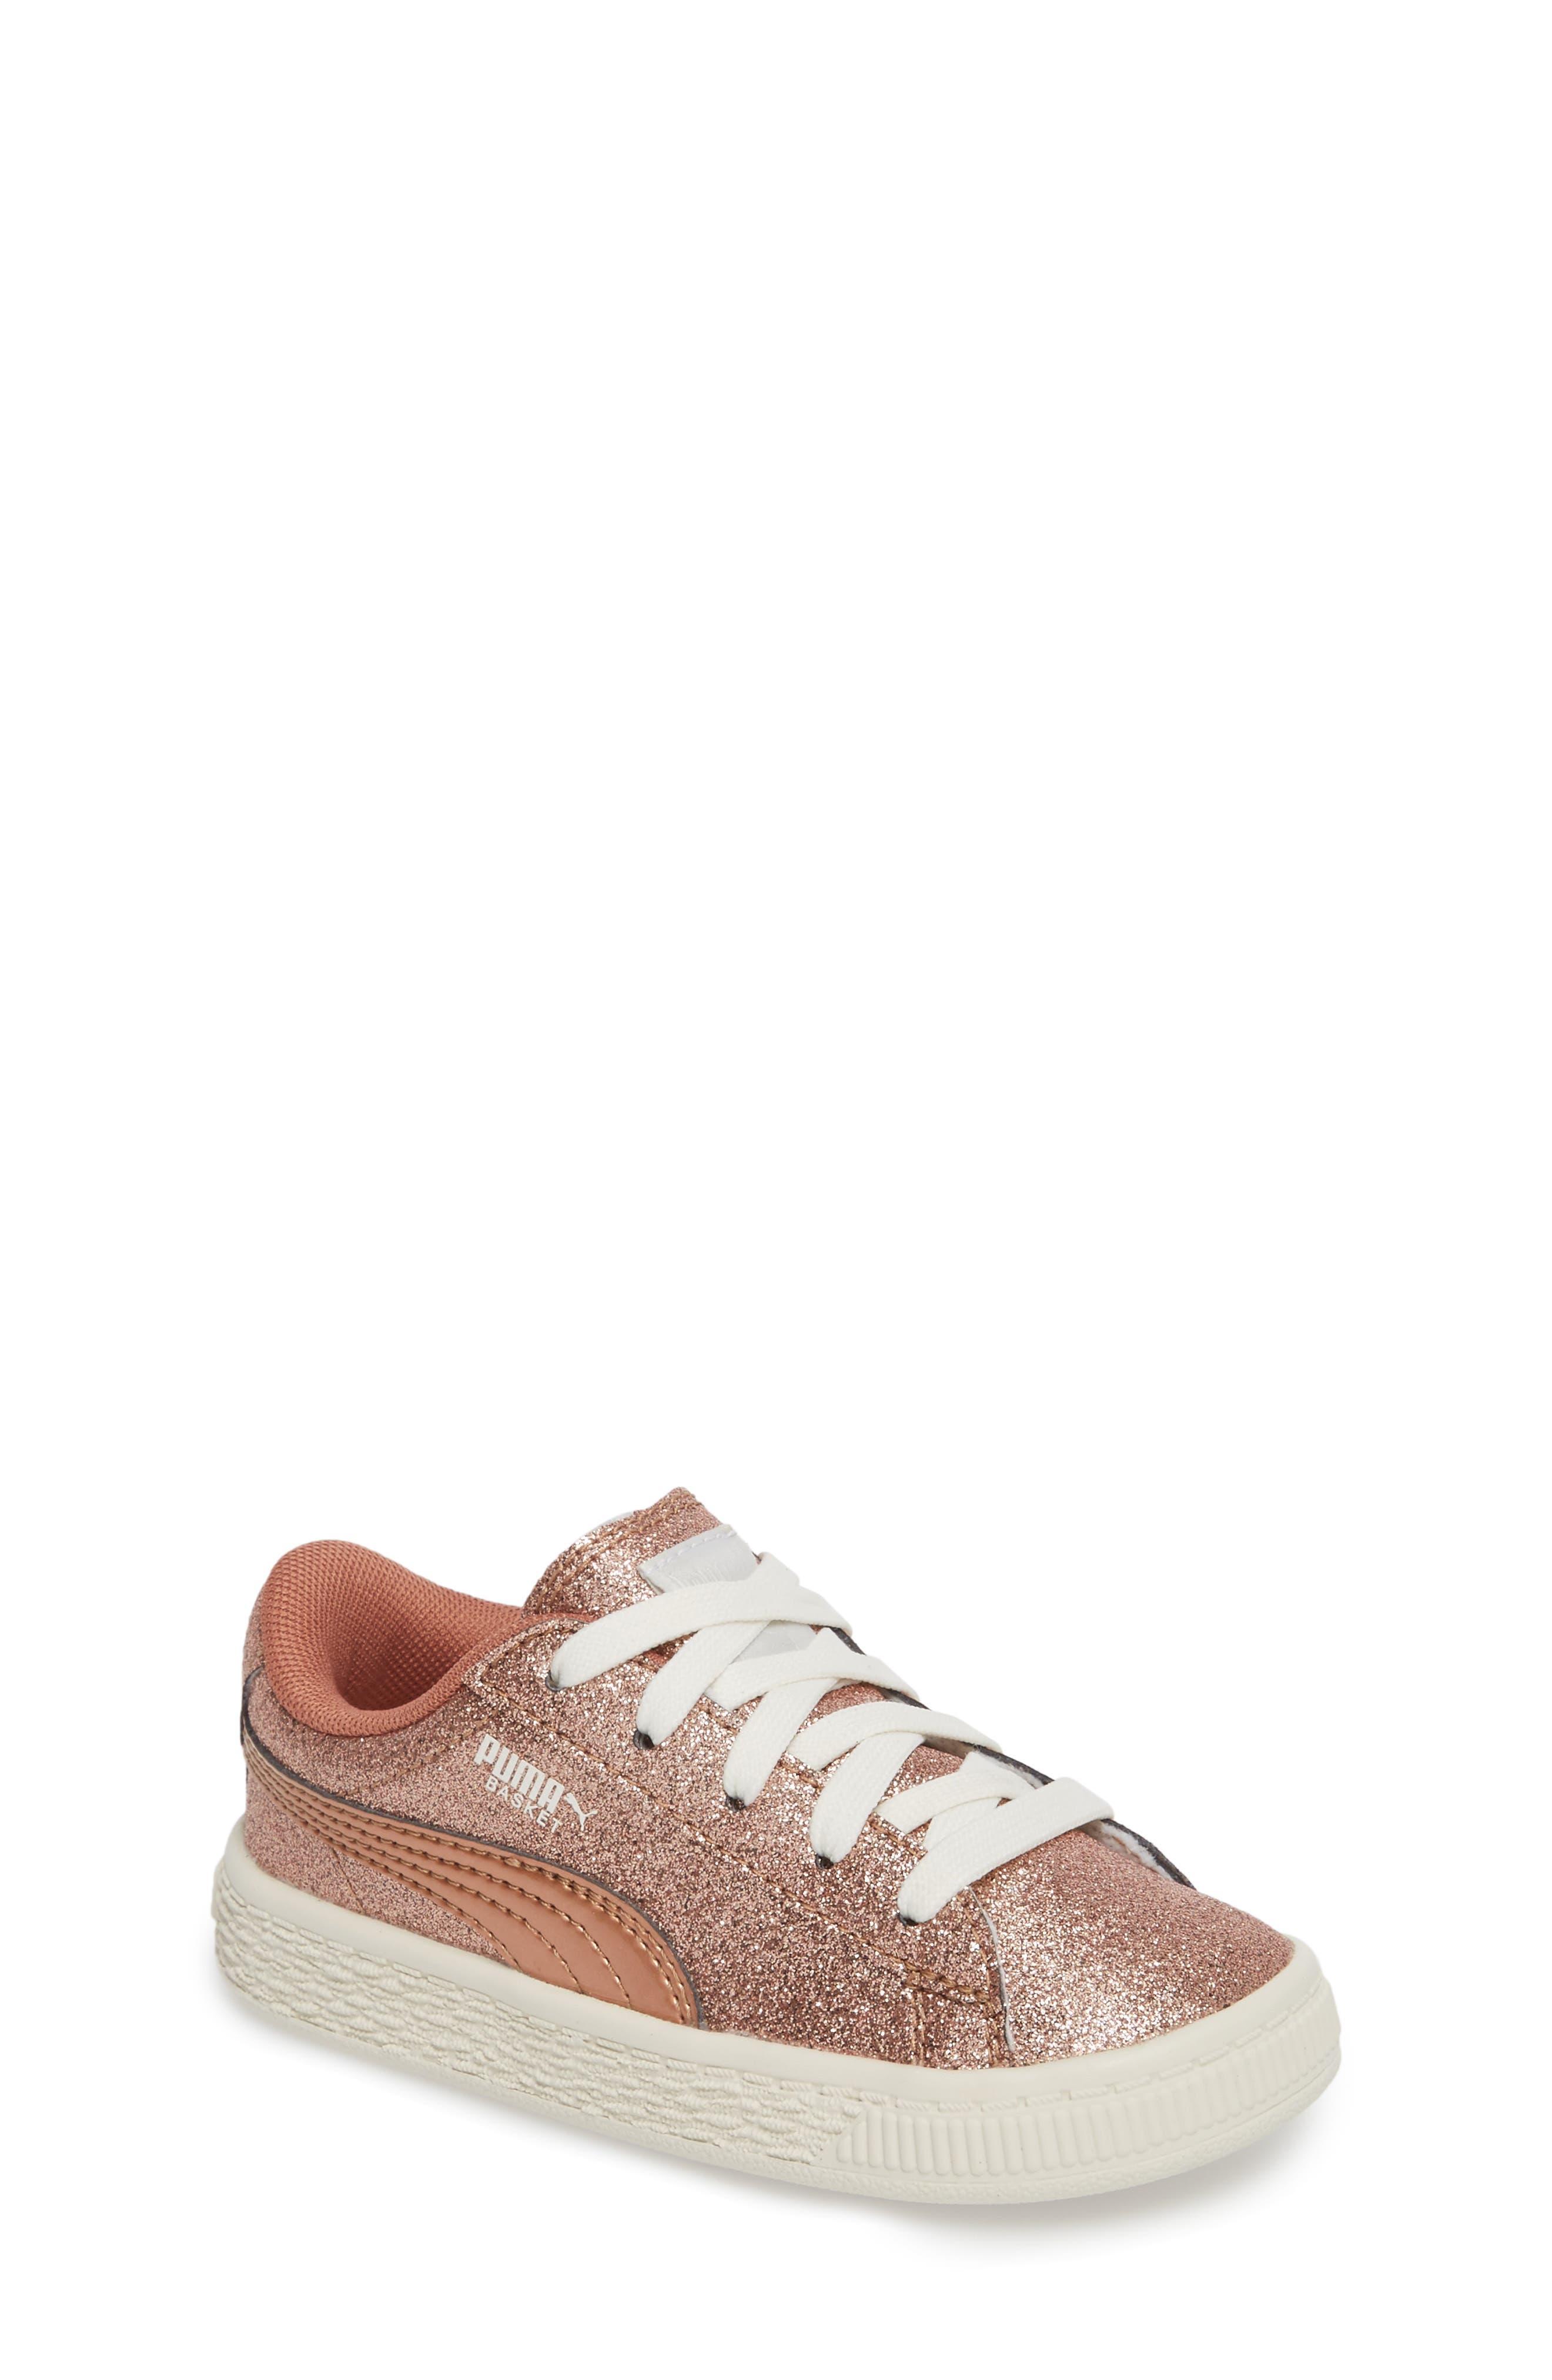 Basket Holiday Glitz Jr. Sneaker,                             Main thumbnail 1, color,                             Copper Rose